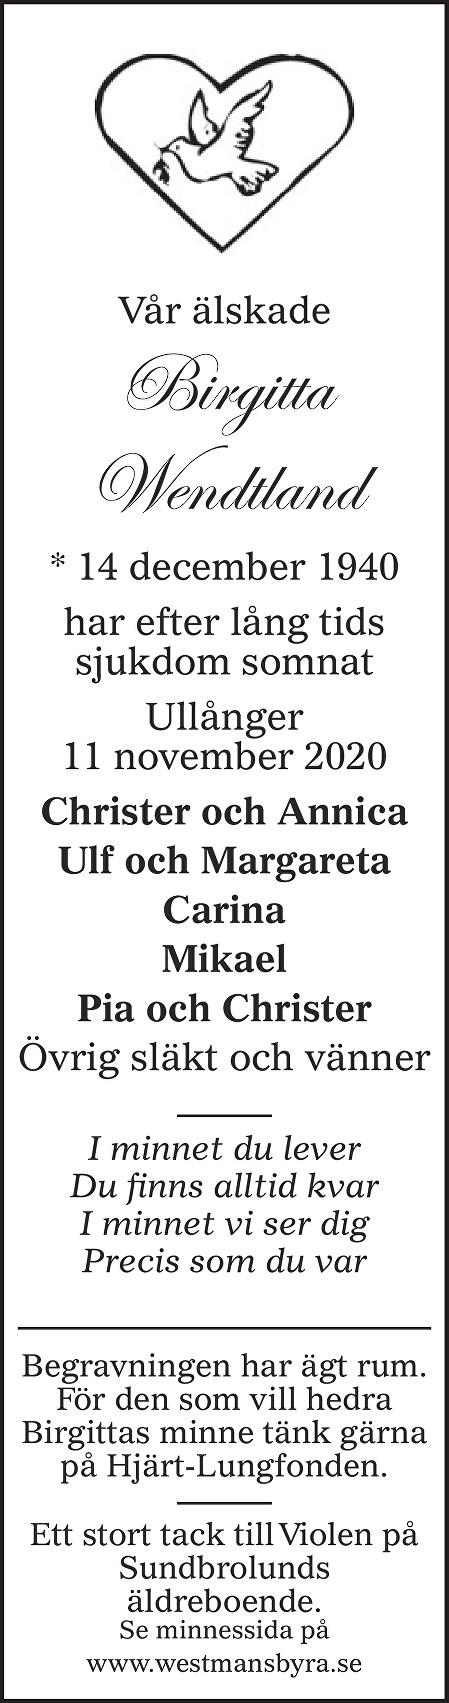 Birgitta Wendtland Death notice